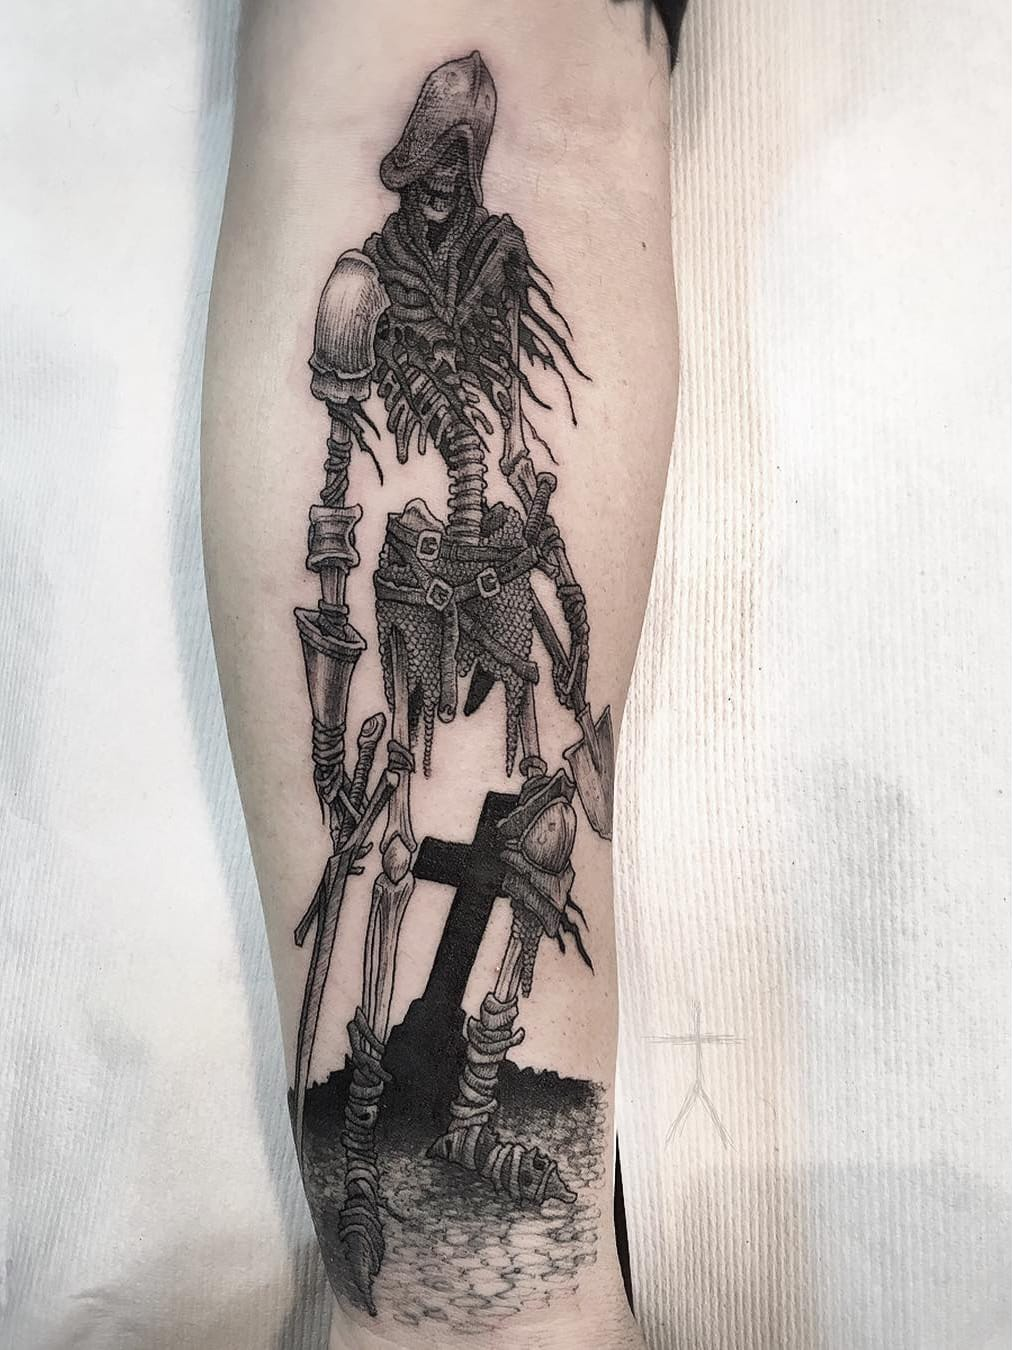 De volta dos mortos #ChristopherJadeCuevas #CJTattooer #gringo #blackwork #fromhell #dark #skull #cranio #caveira #bones #ossos #warrior #guerreiro #sword #espada #cemitery #cemiterio #cross #cruz